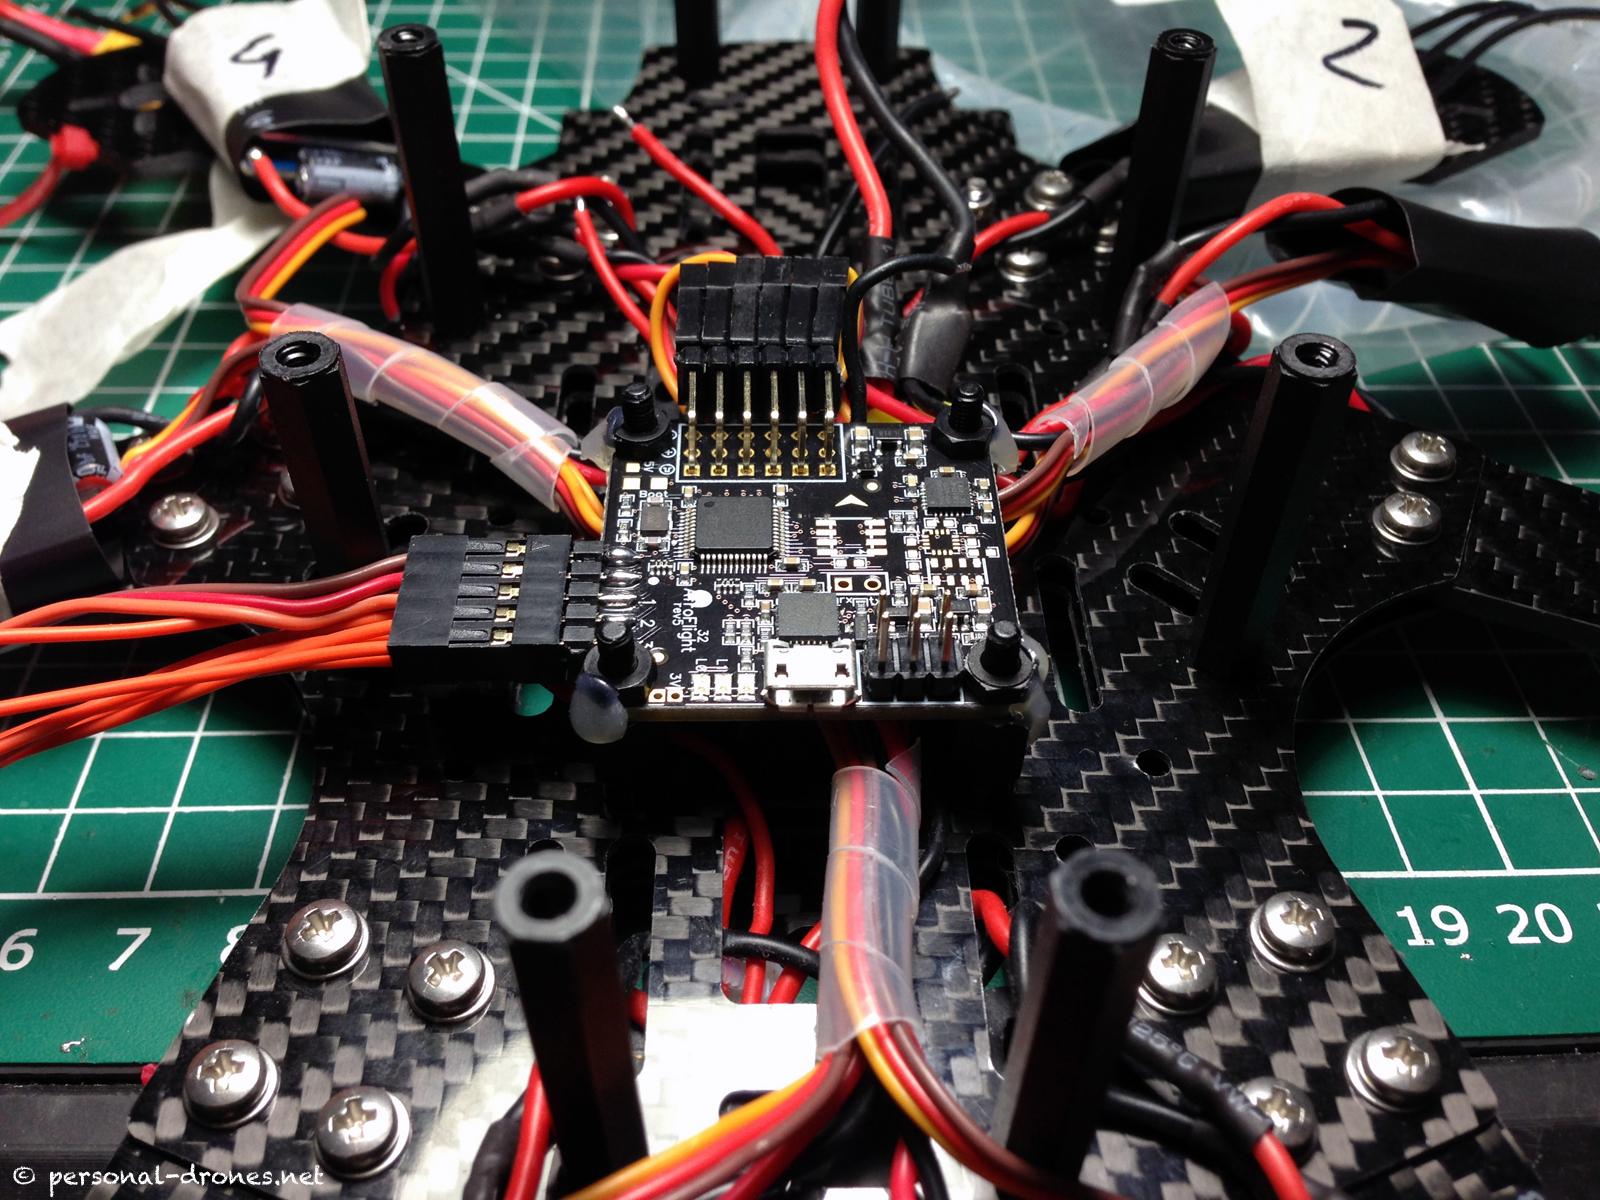 Personal Drones Page 6 Naze32 Rev5 Schematic Acronaze32 On Blackout Mini Spider Hex